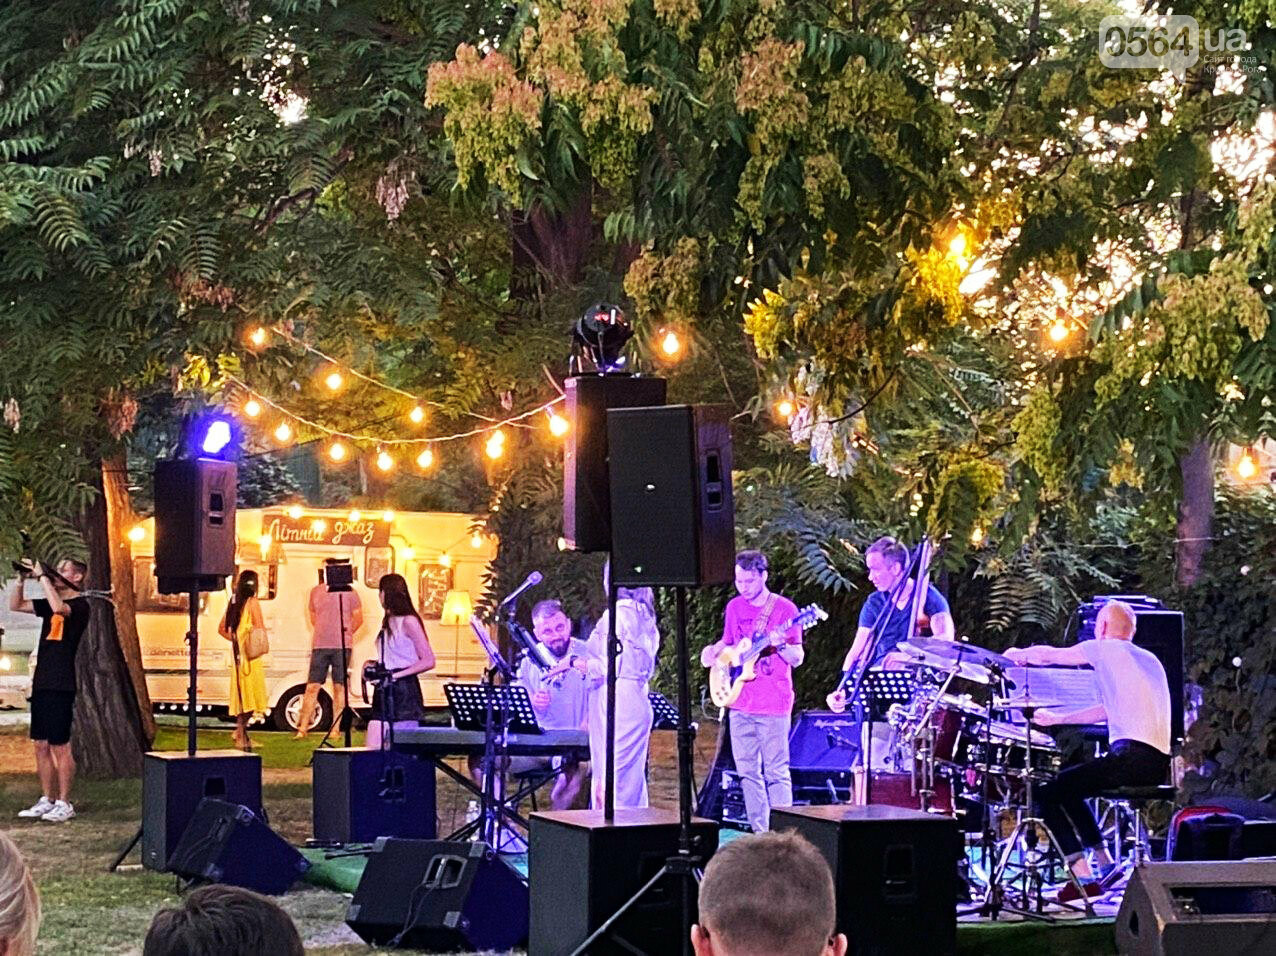 Под звездным небом криворожане наслаждались летним джазом от  Advantage Project, - ФОТО, ВИДЕО , фото-45